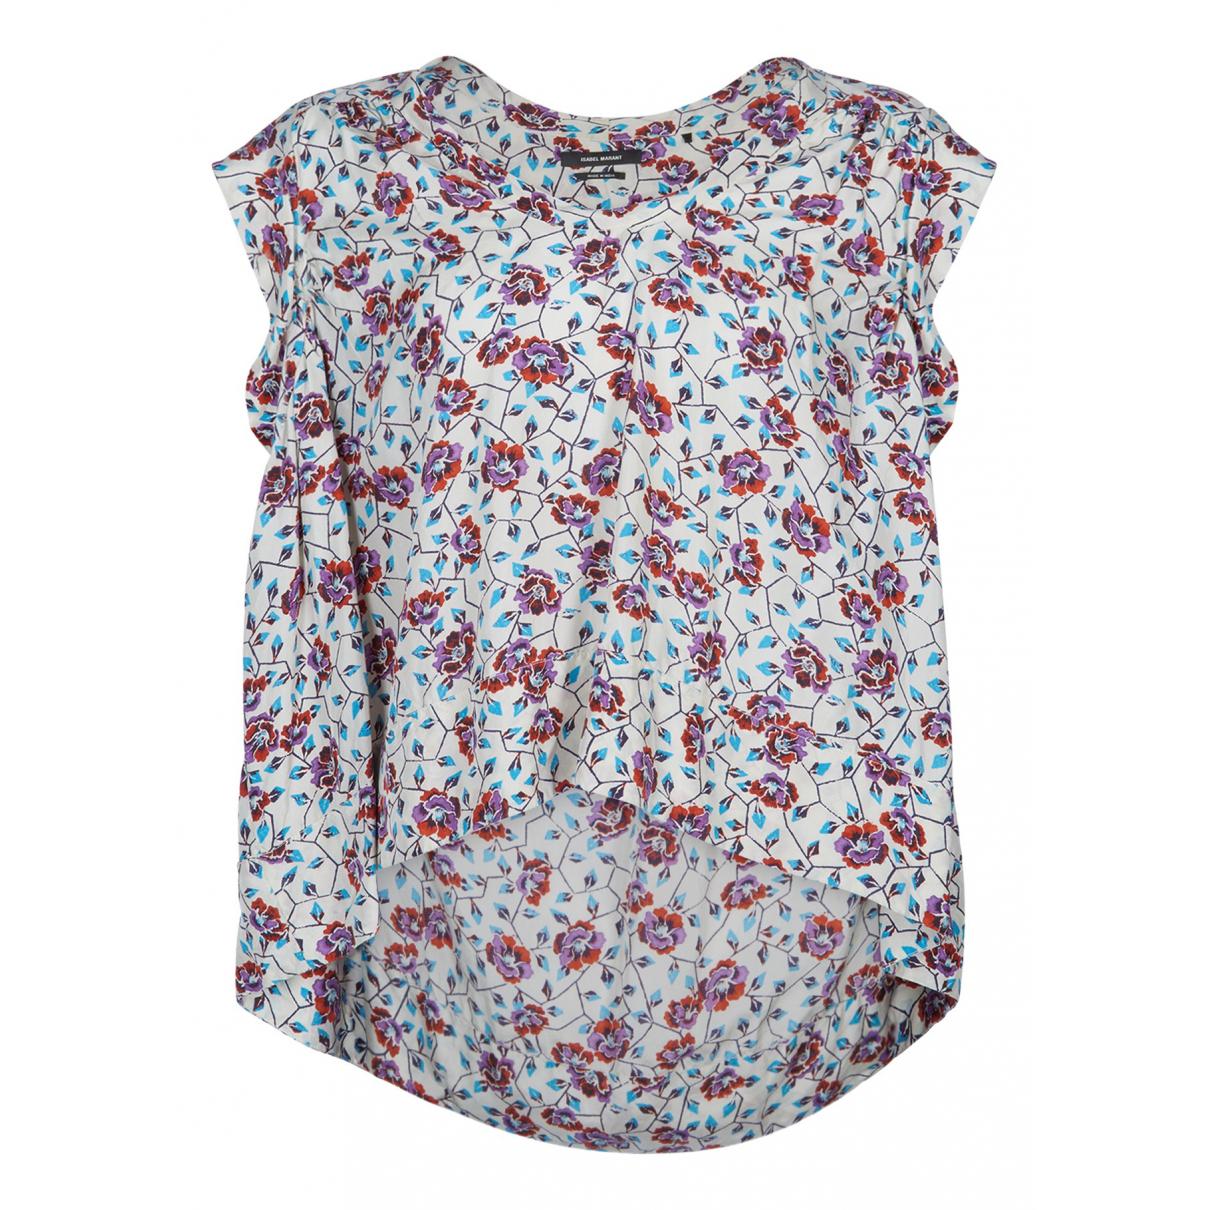 Isabel Marant N Multicolour Silk  top for Women 14 UK